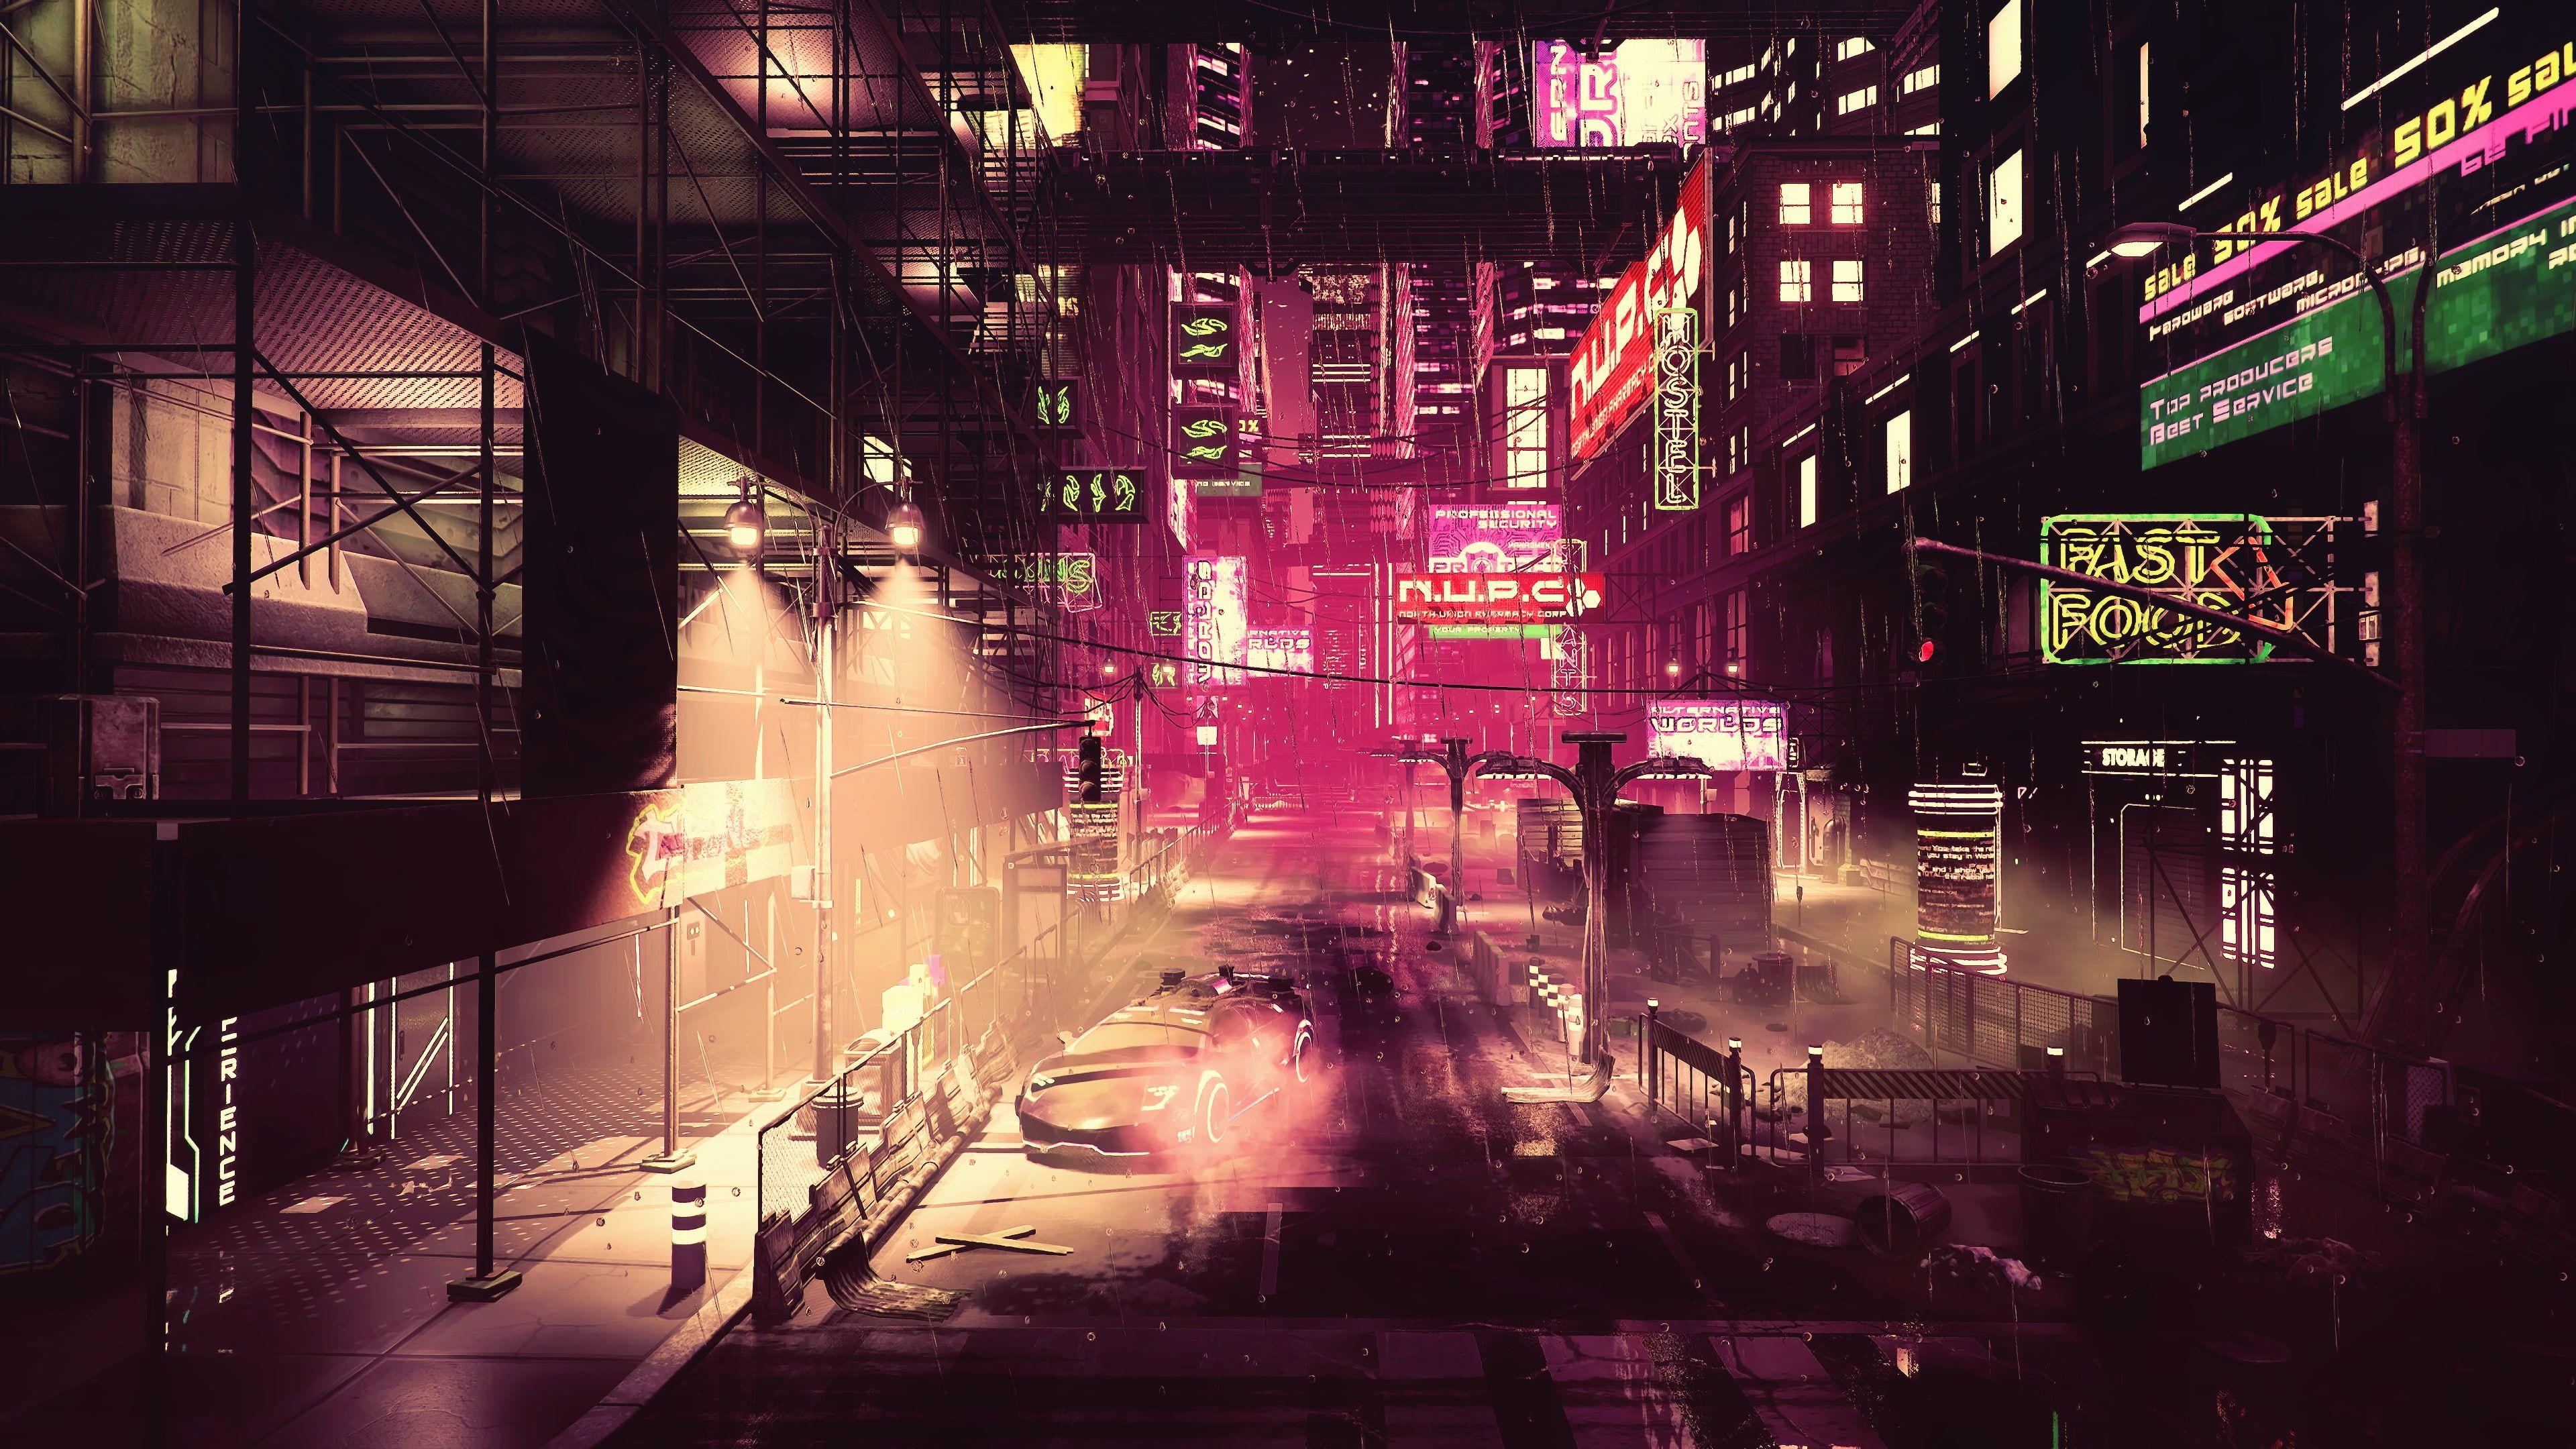 Night Artwork Futuristic City Cyberpunk Cyber Science Fiction Digital Art Concept Art Fantasy Art Cgi Fan Art Dyst In 2020 Futuristic City Hd Wallpaper Cyberpunk